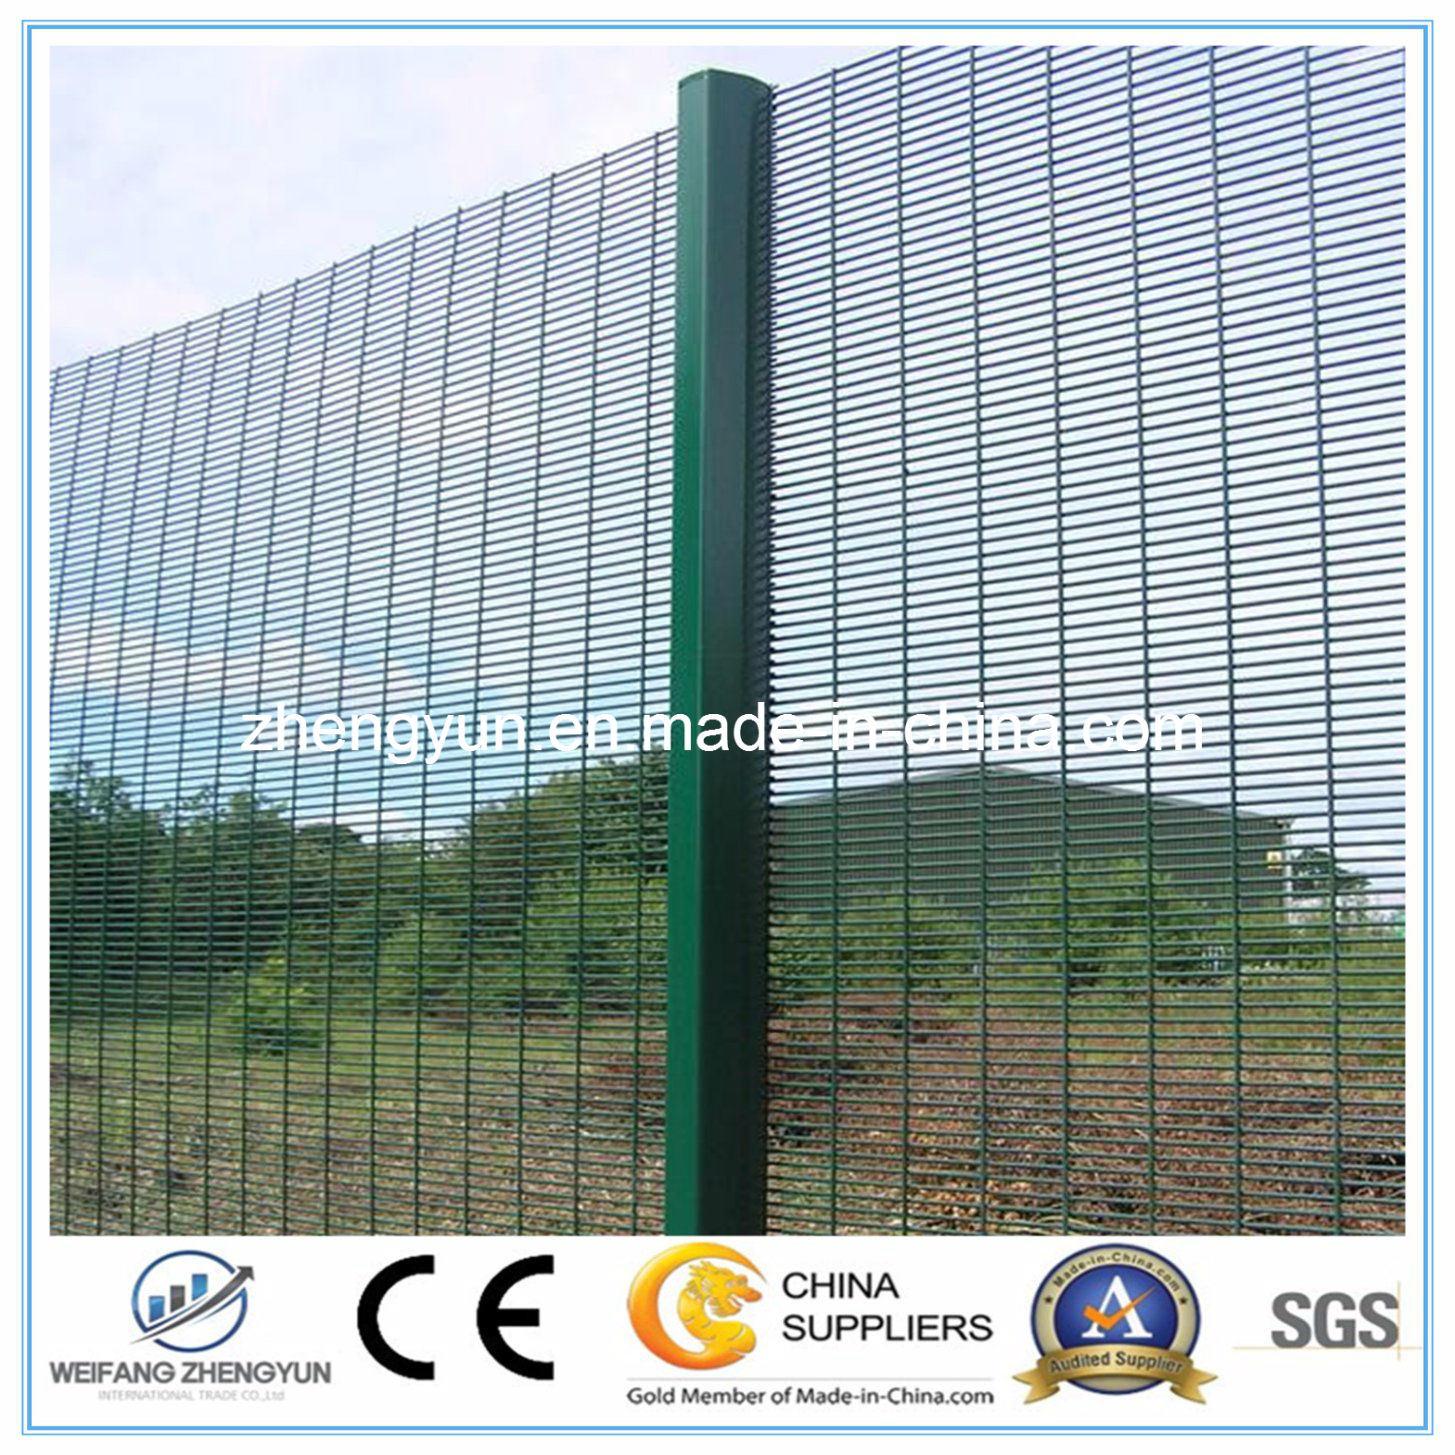 Anti Climb 358 High Security Fencing System Cheap Clear Vu Fence